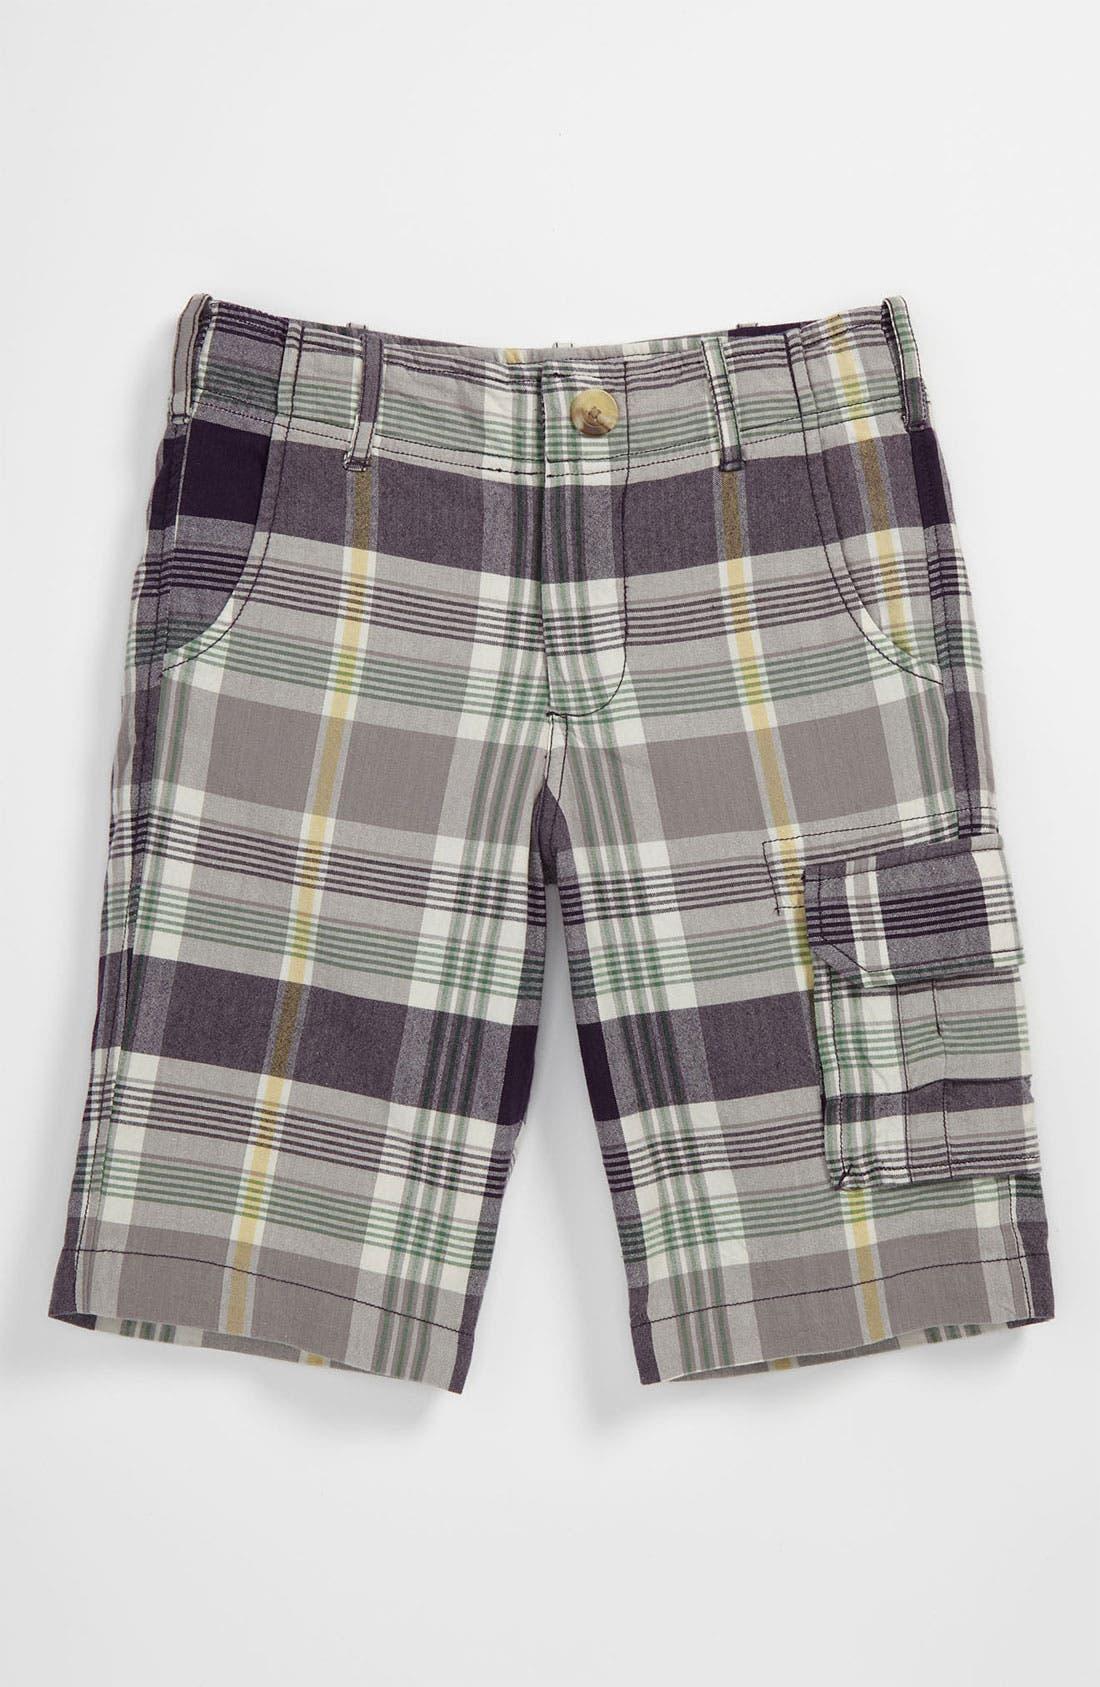 Alternate Image 1 Selected - Peek 'Oxford' Plaid Shorts (Big Boys)